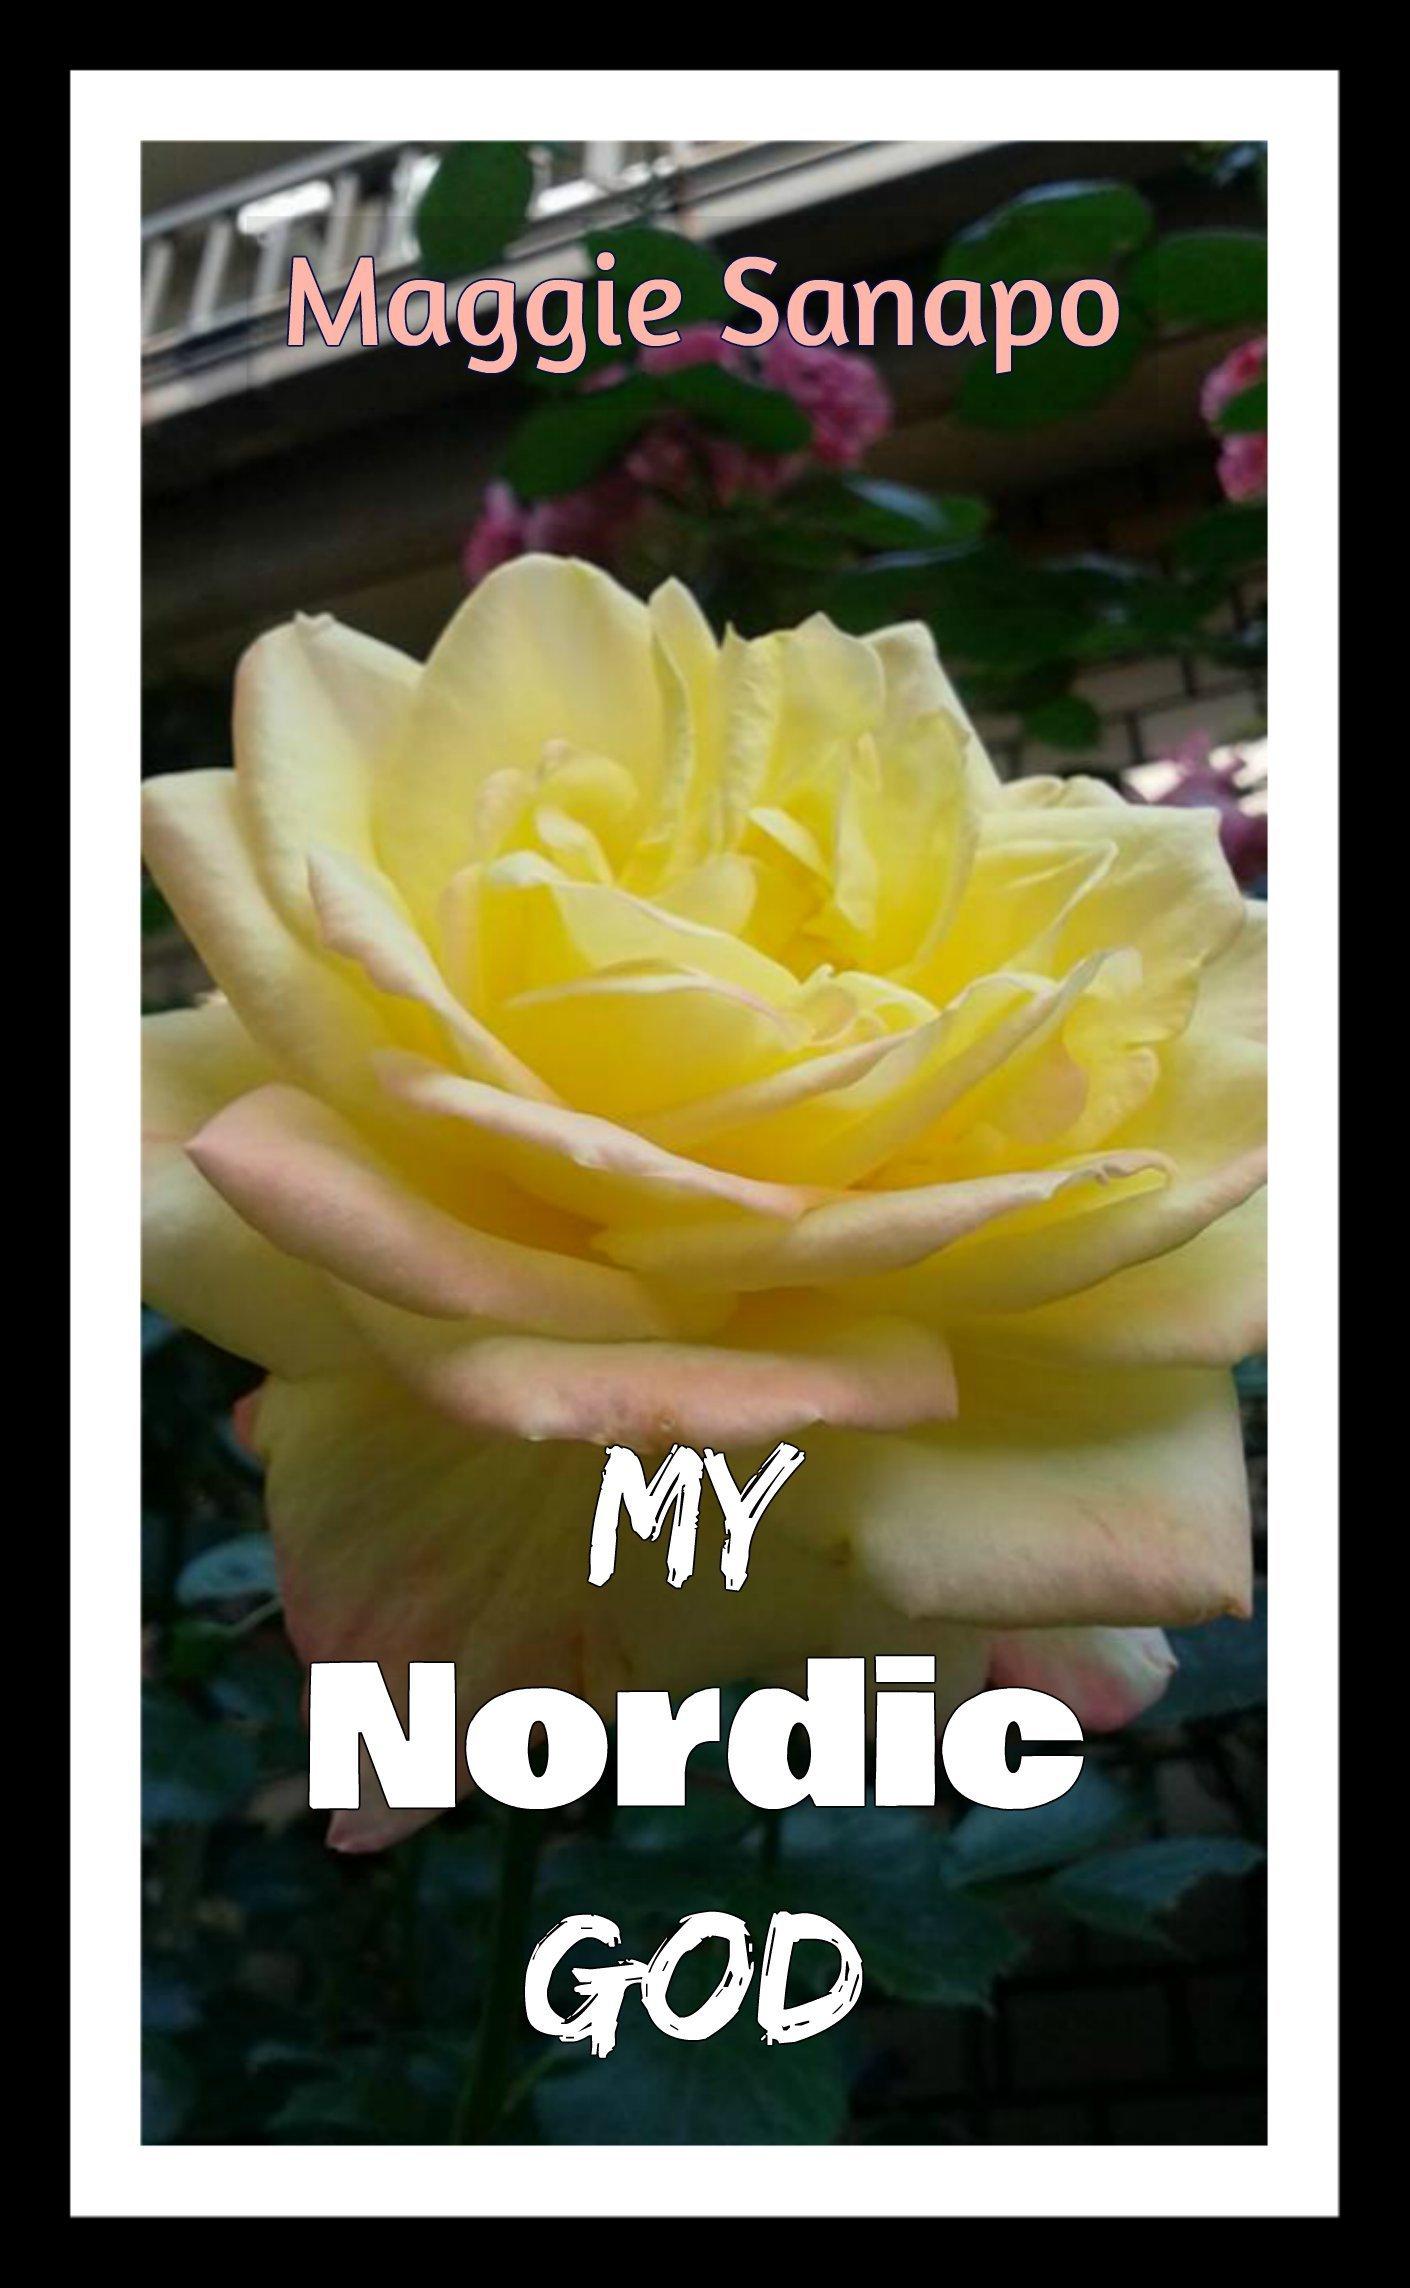 My Nordic God